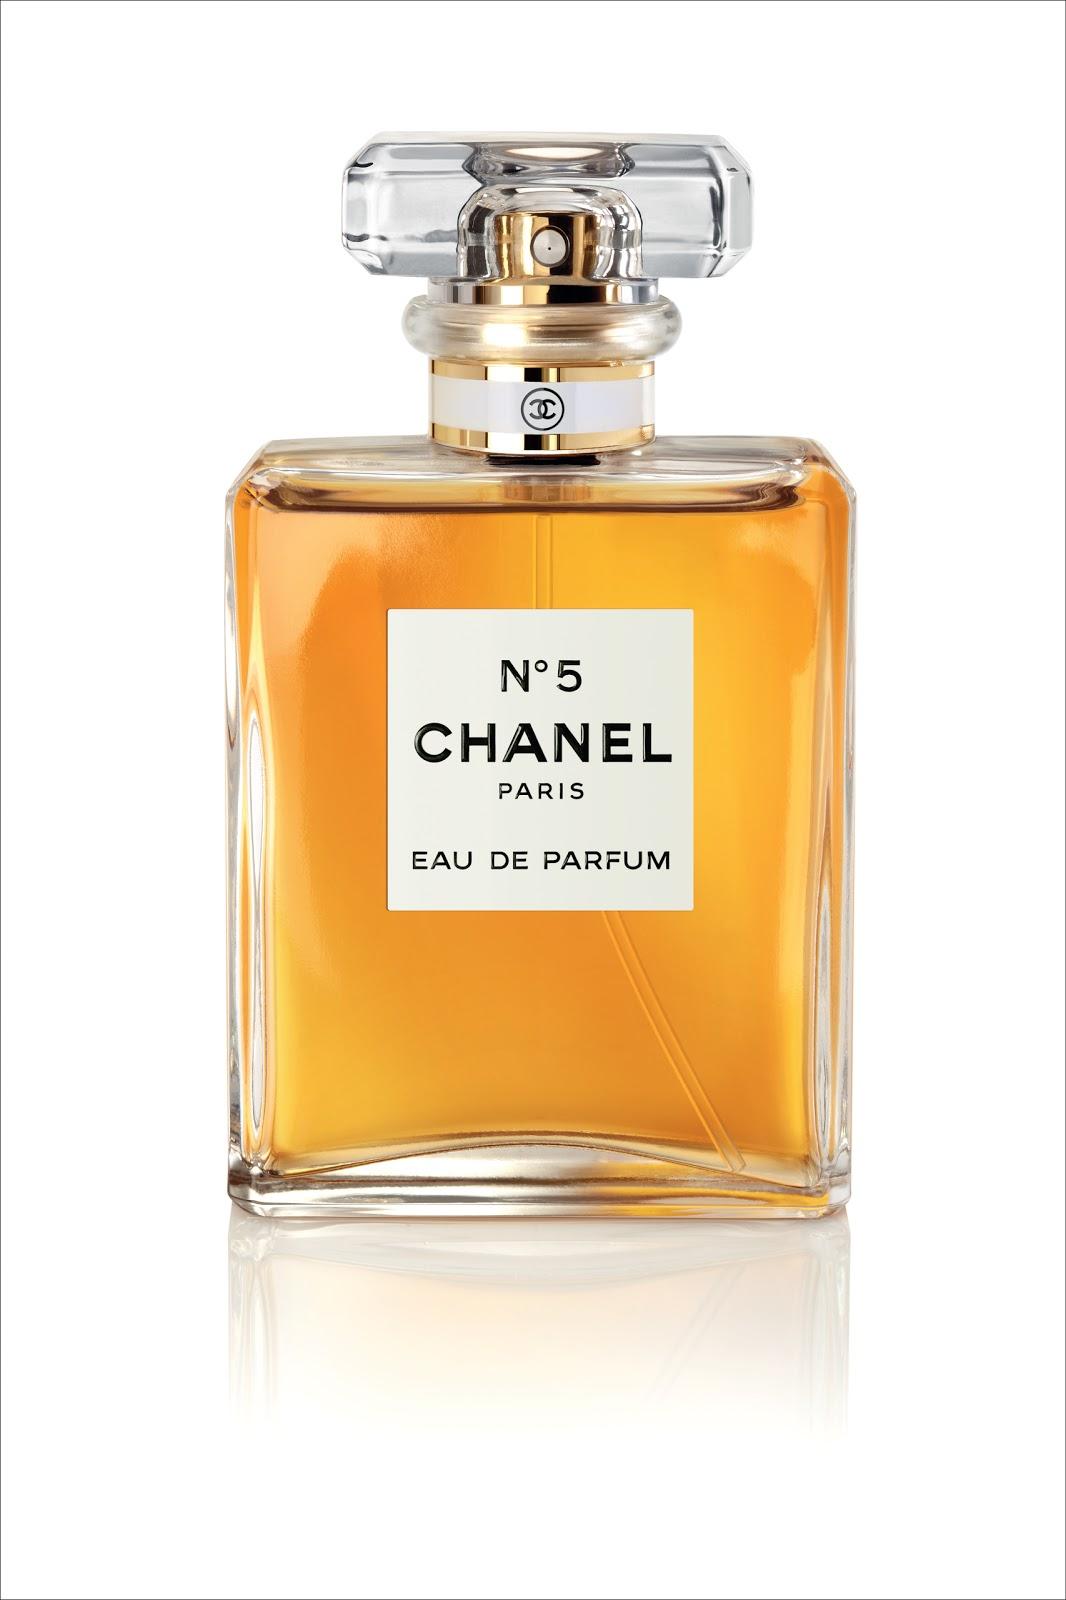 Tessa Williams: World of Perfumes: January 2013